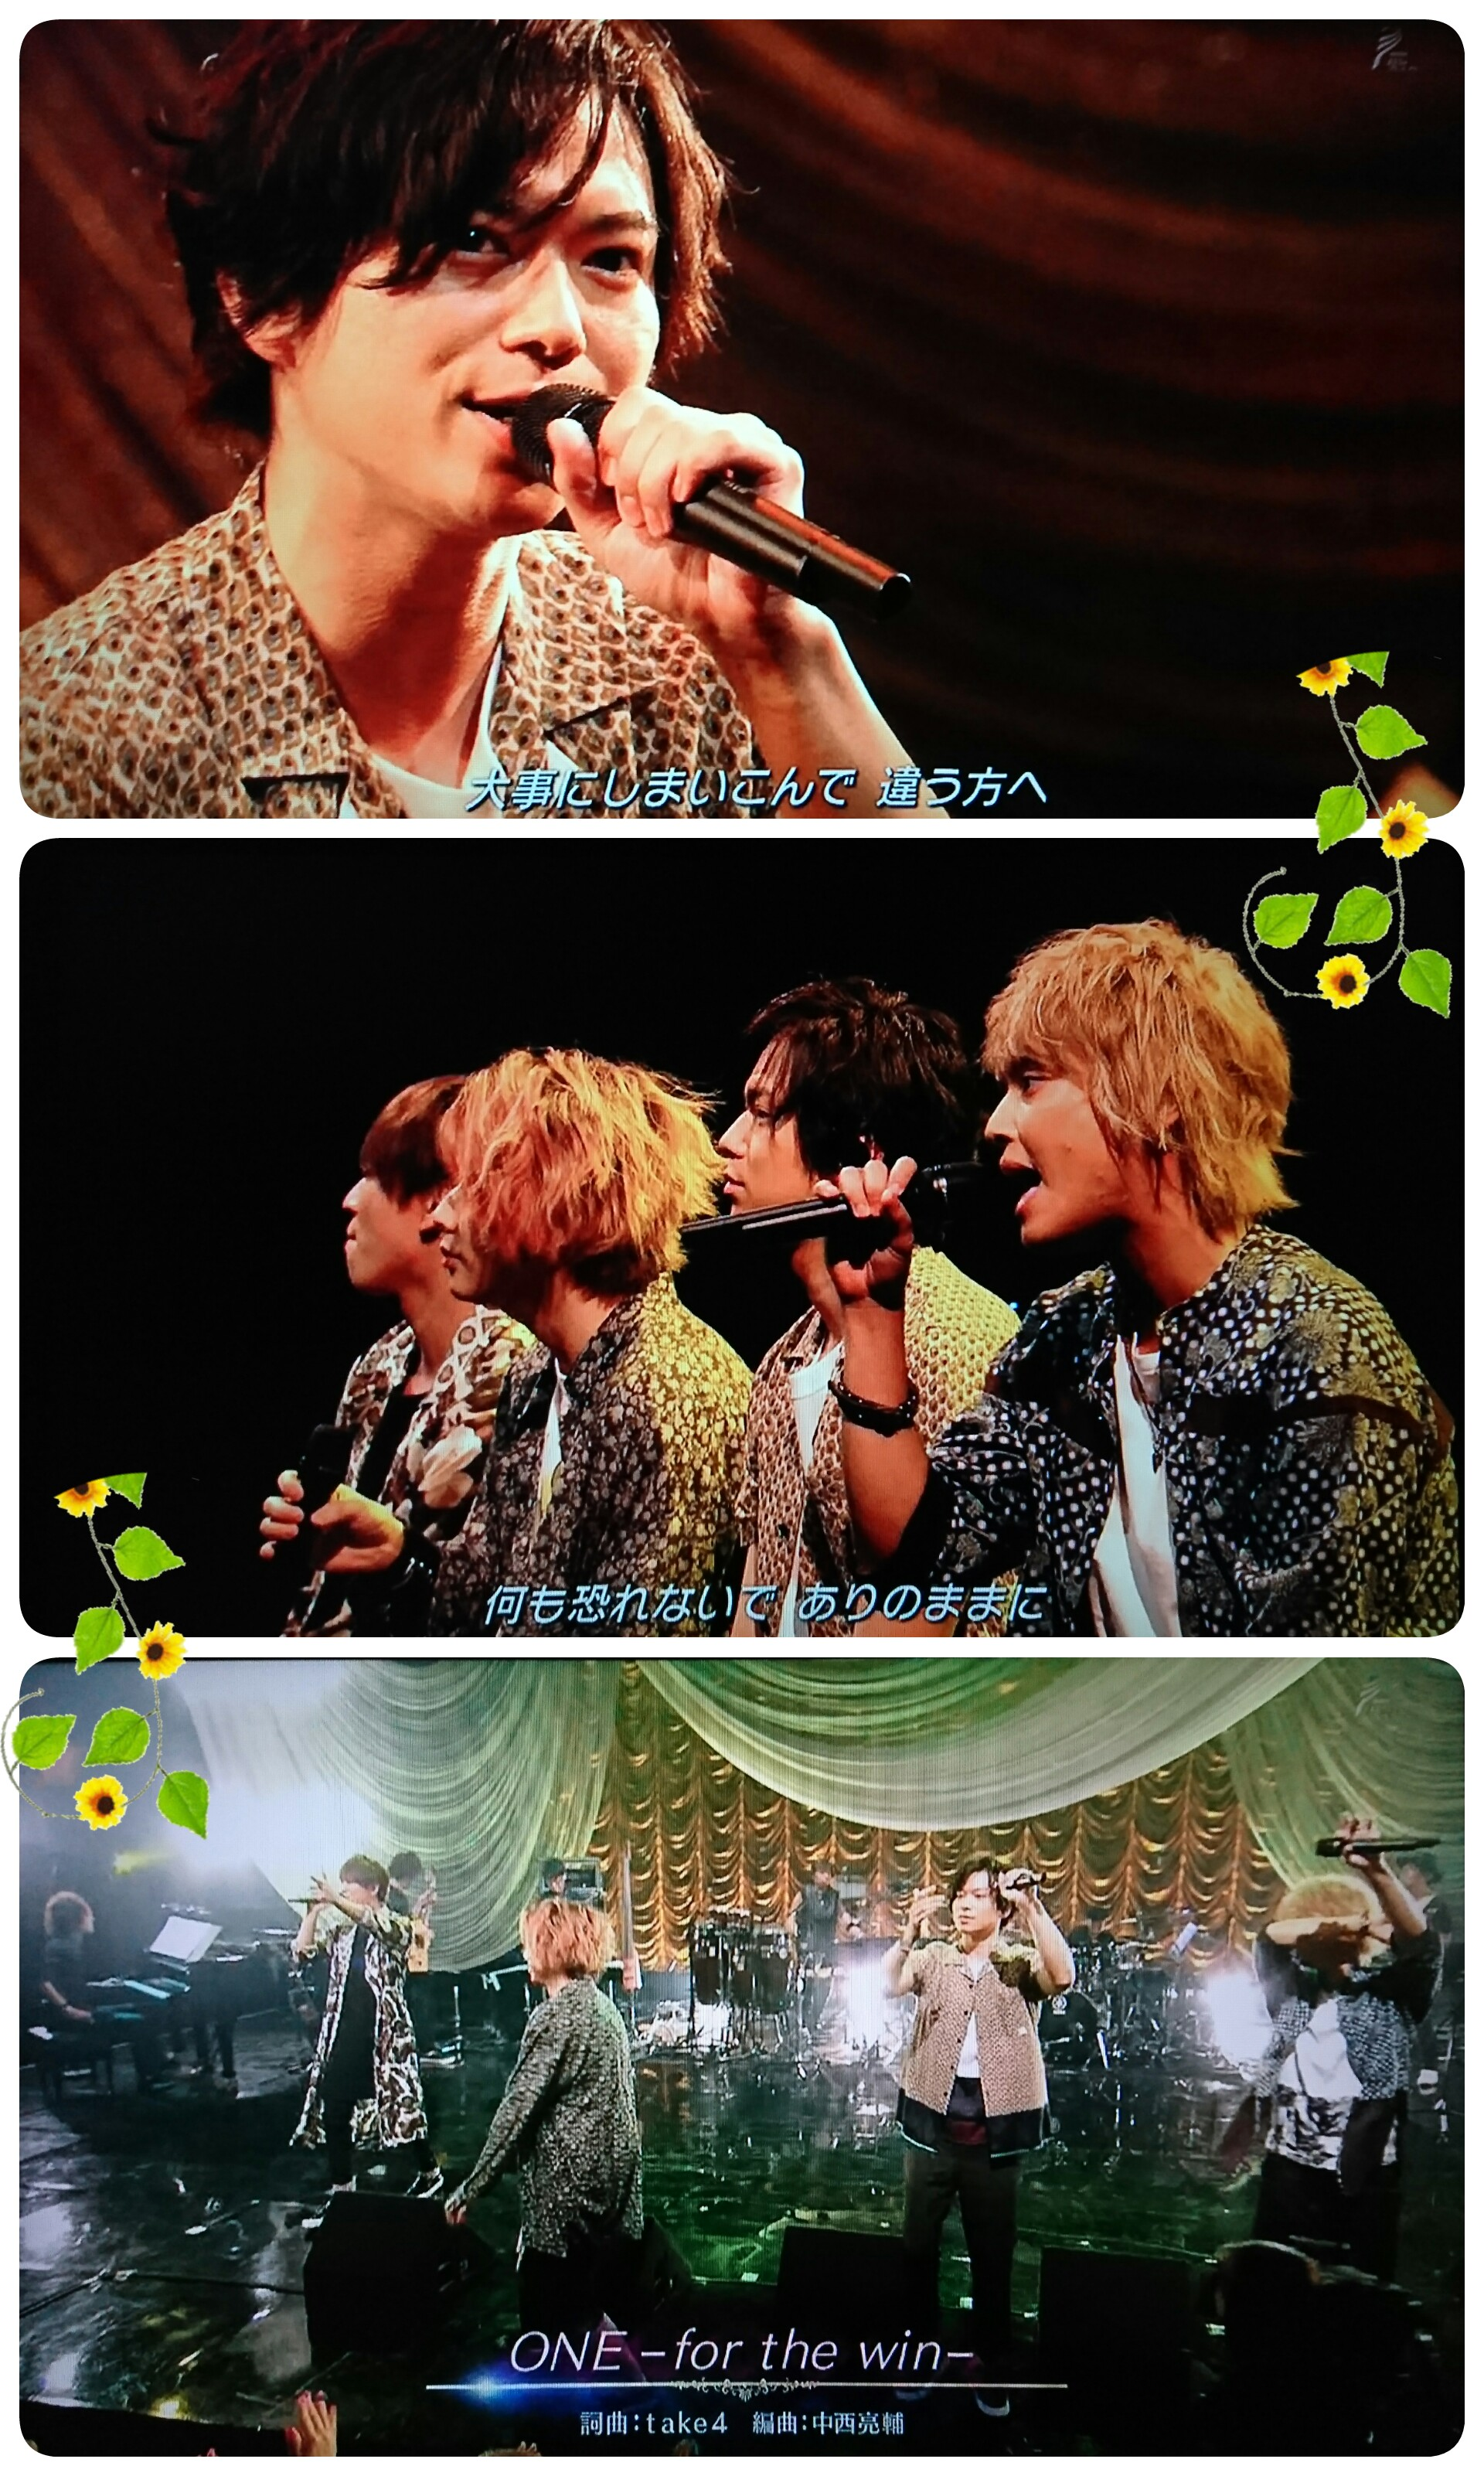 f:id:sunflower-shigeaki:20170831001011j:image